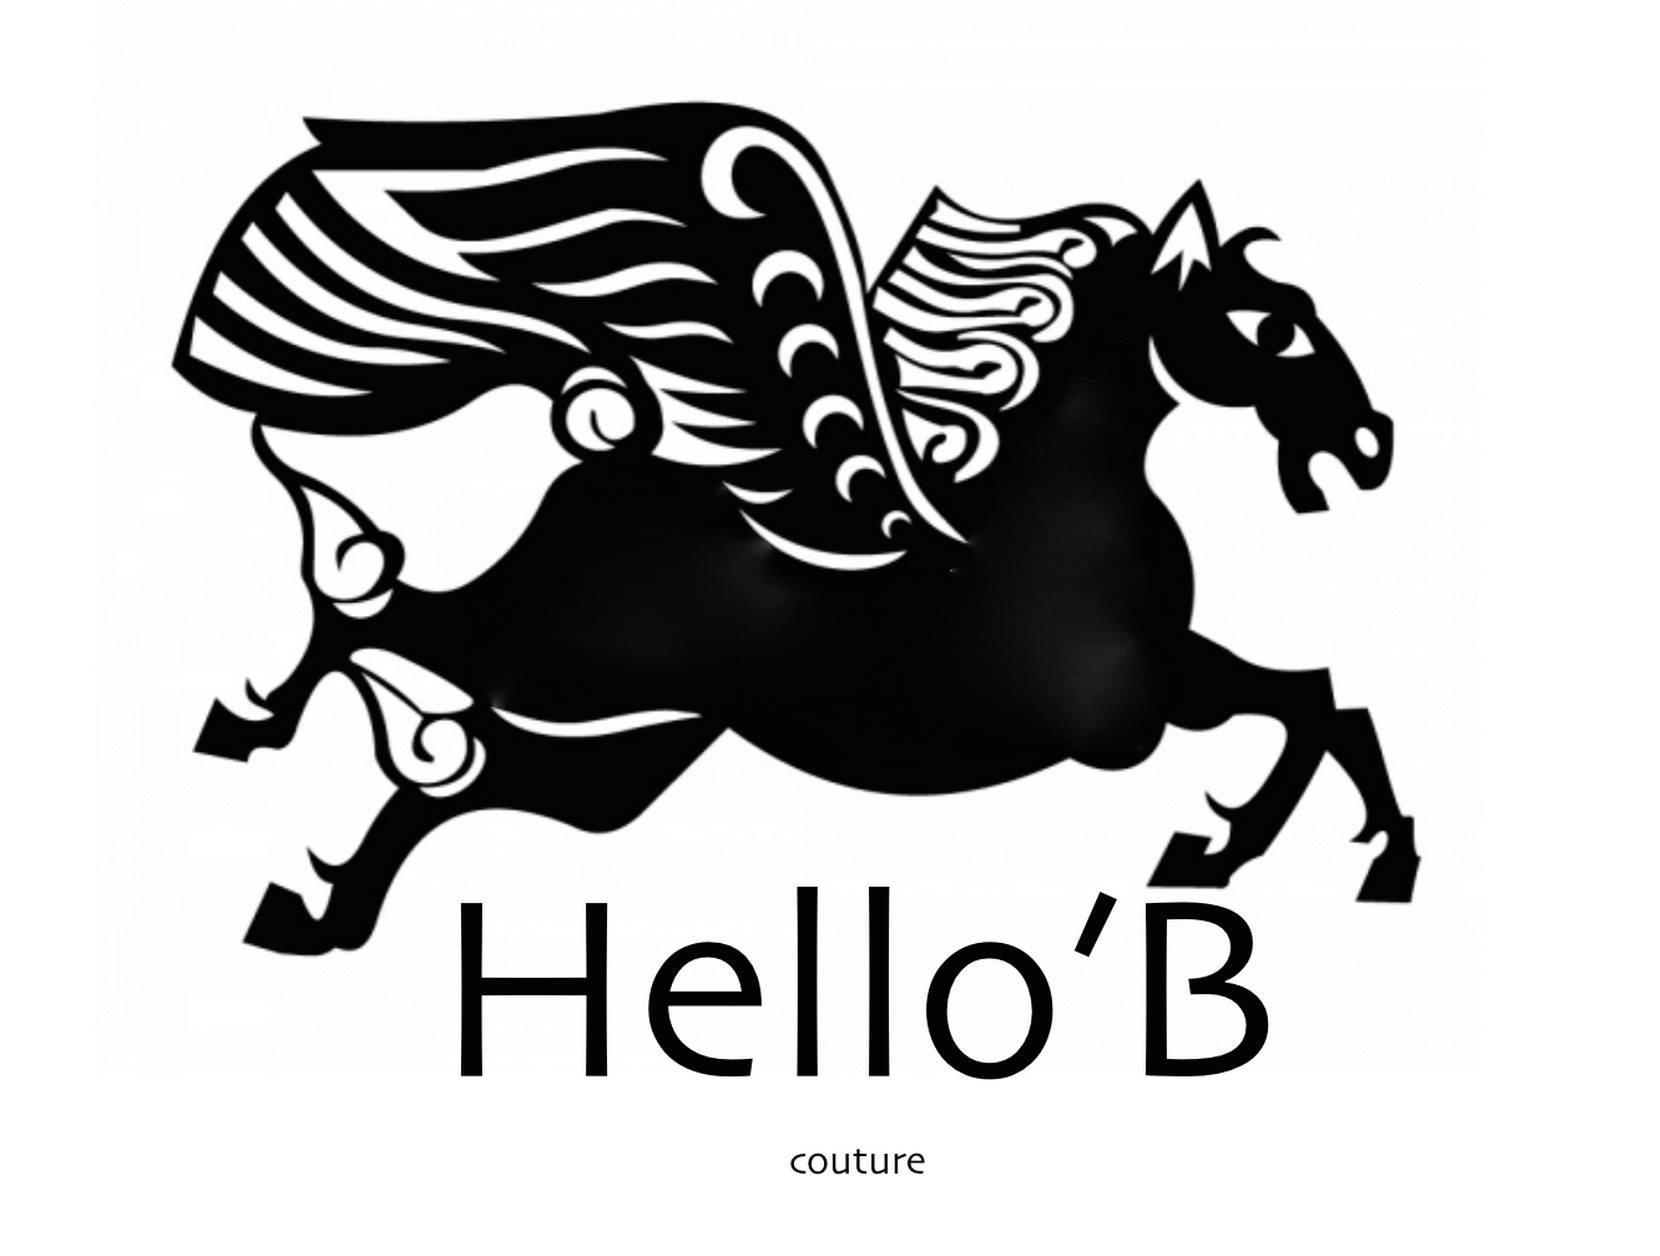 Hello'B